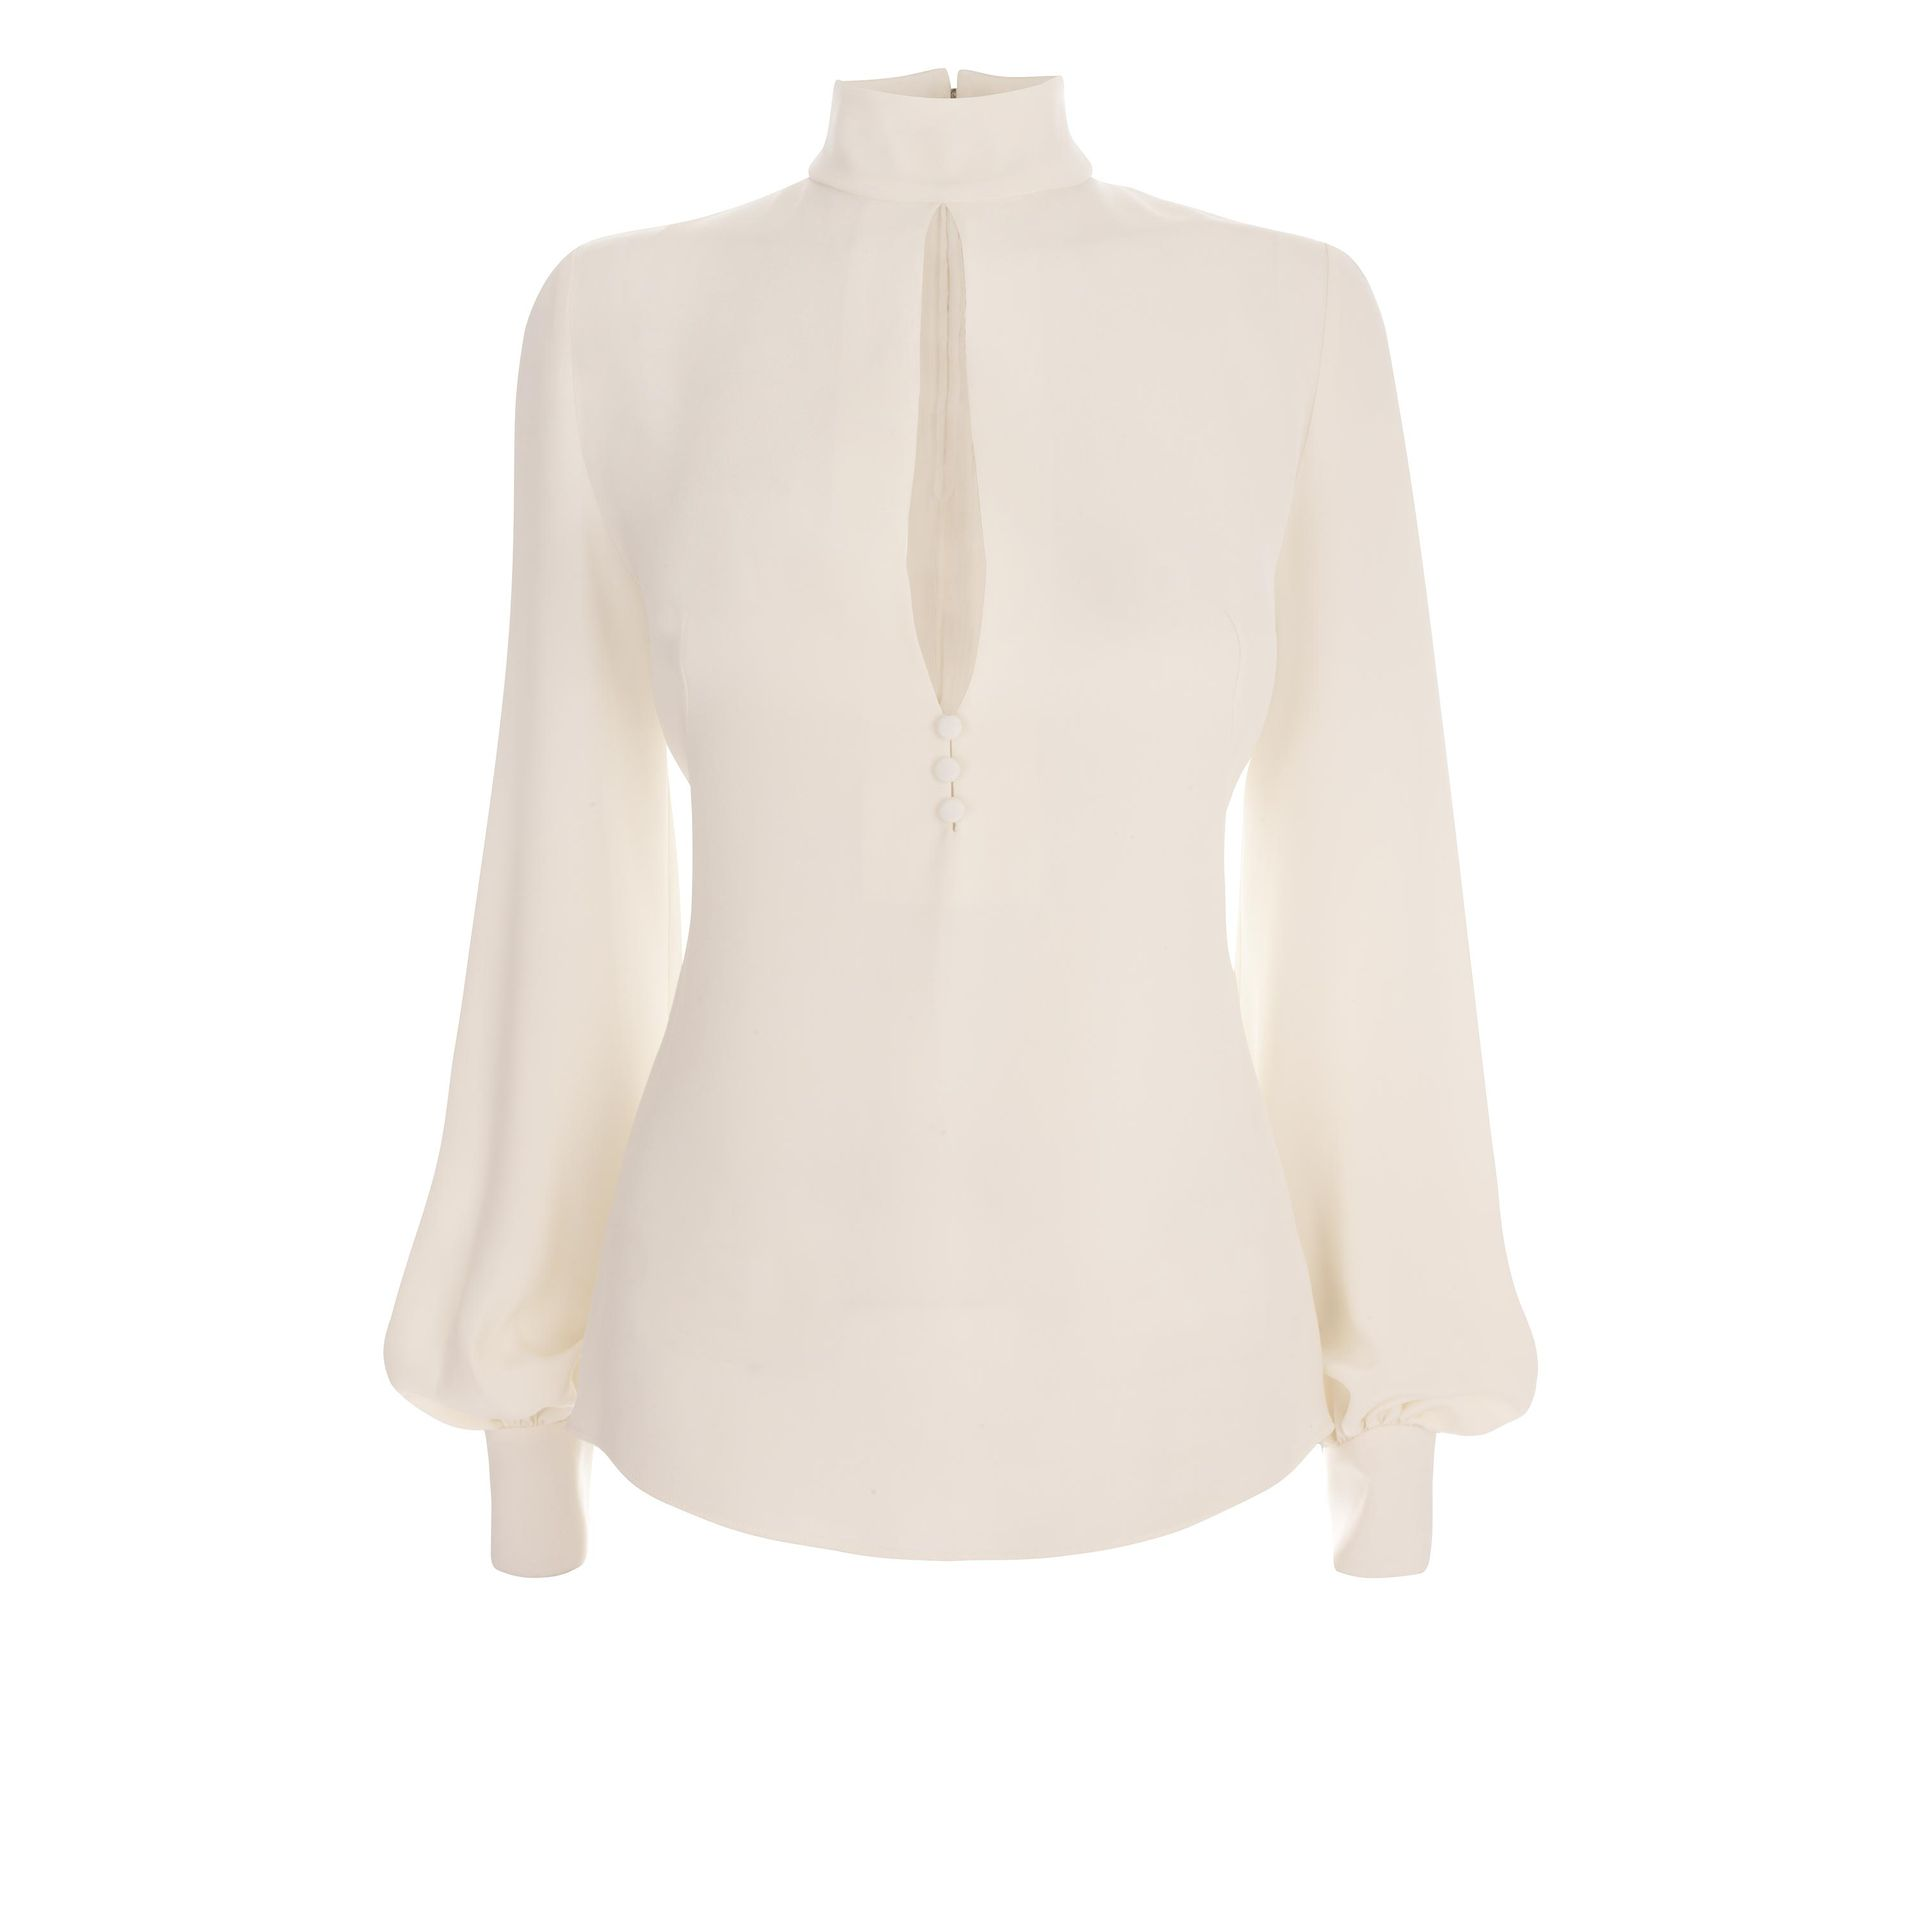 aaa0042dcd6782 Lyst - Alexander McQueen High-neck Keyhole Blouse in White